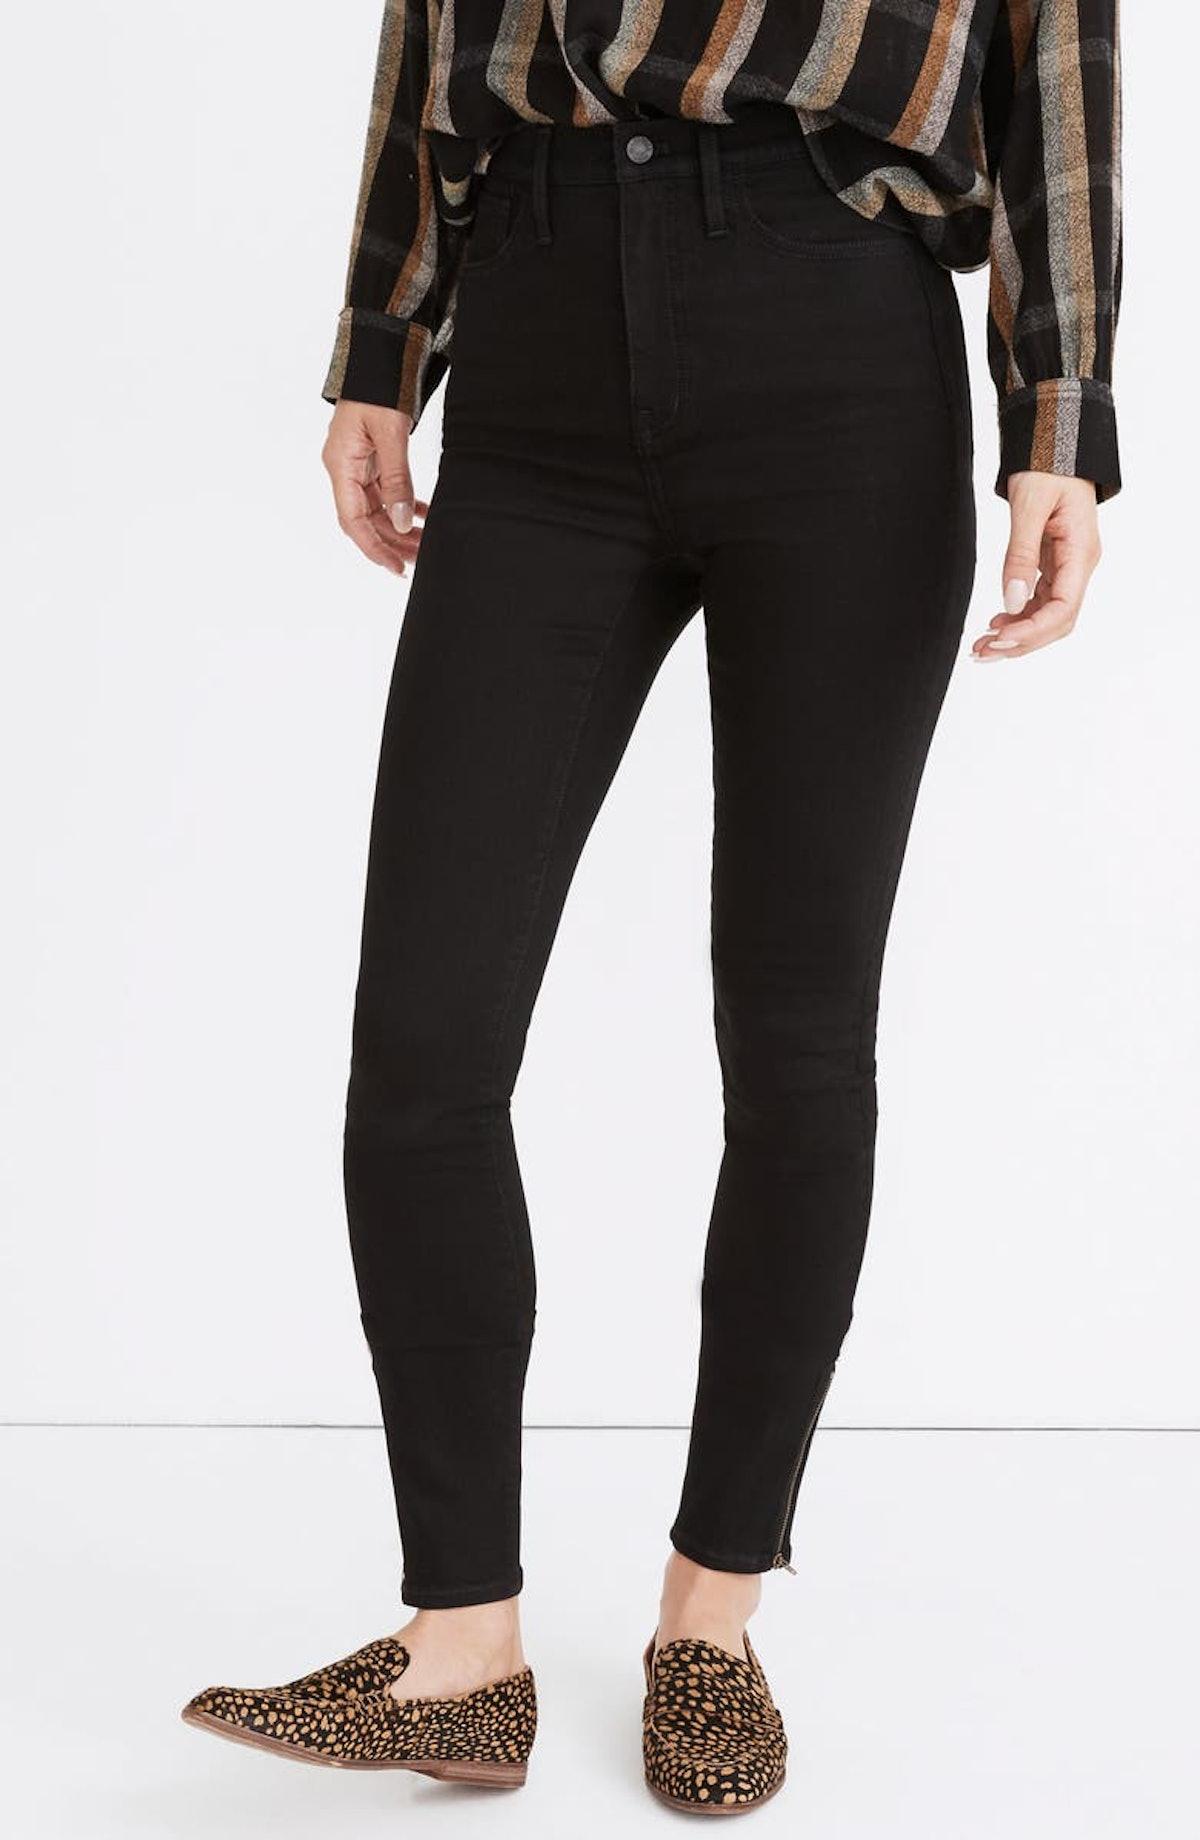 Roadtripper Jeans in Black Frost with Ankle Zip